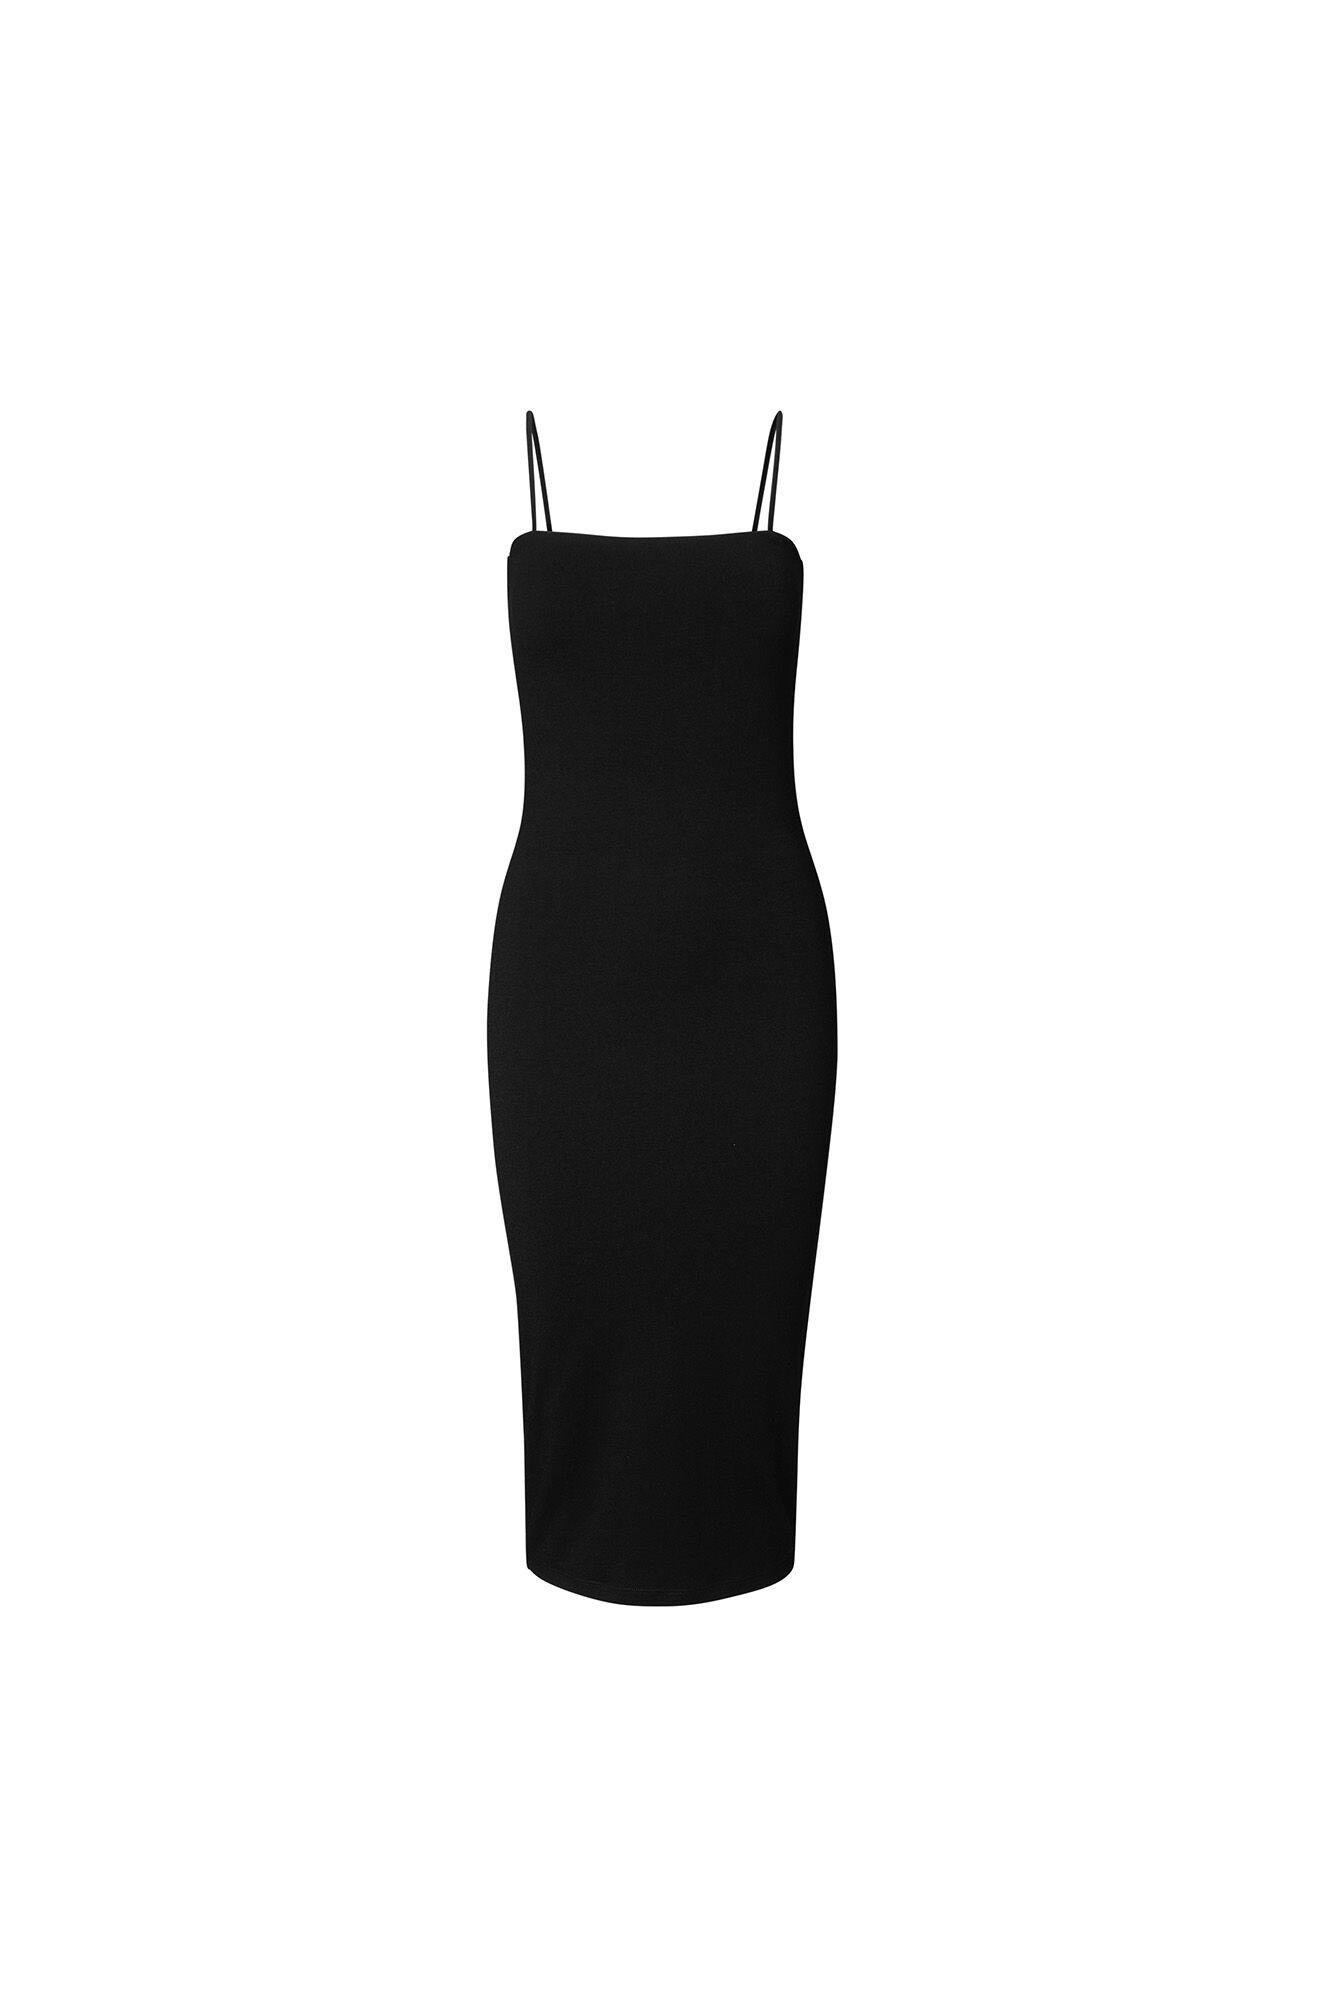 ENNAHLA SL DRESS 5973, BLACK